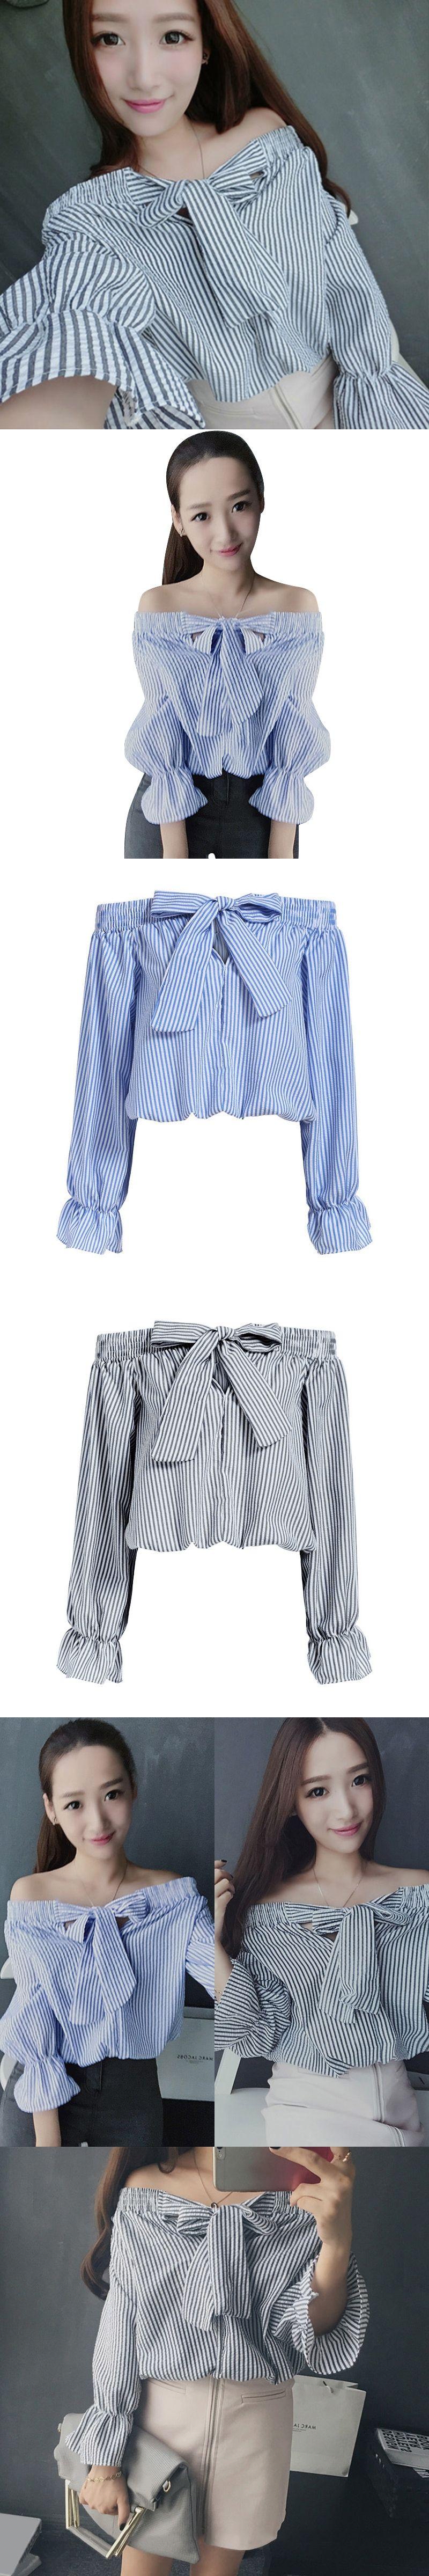 e1b8b2a6539f6c Hot Women Off Shoulder Tops Bow Vertical Striped Vogue Summer Feminine Long  Sleeve Slash Neck Blue